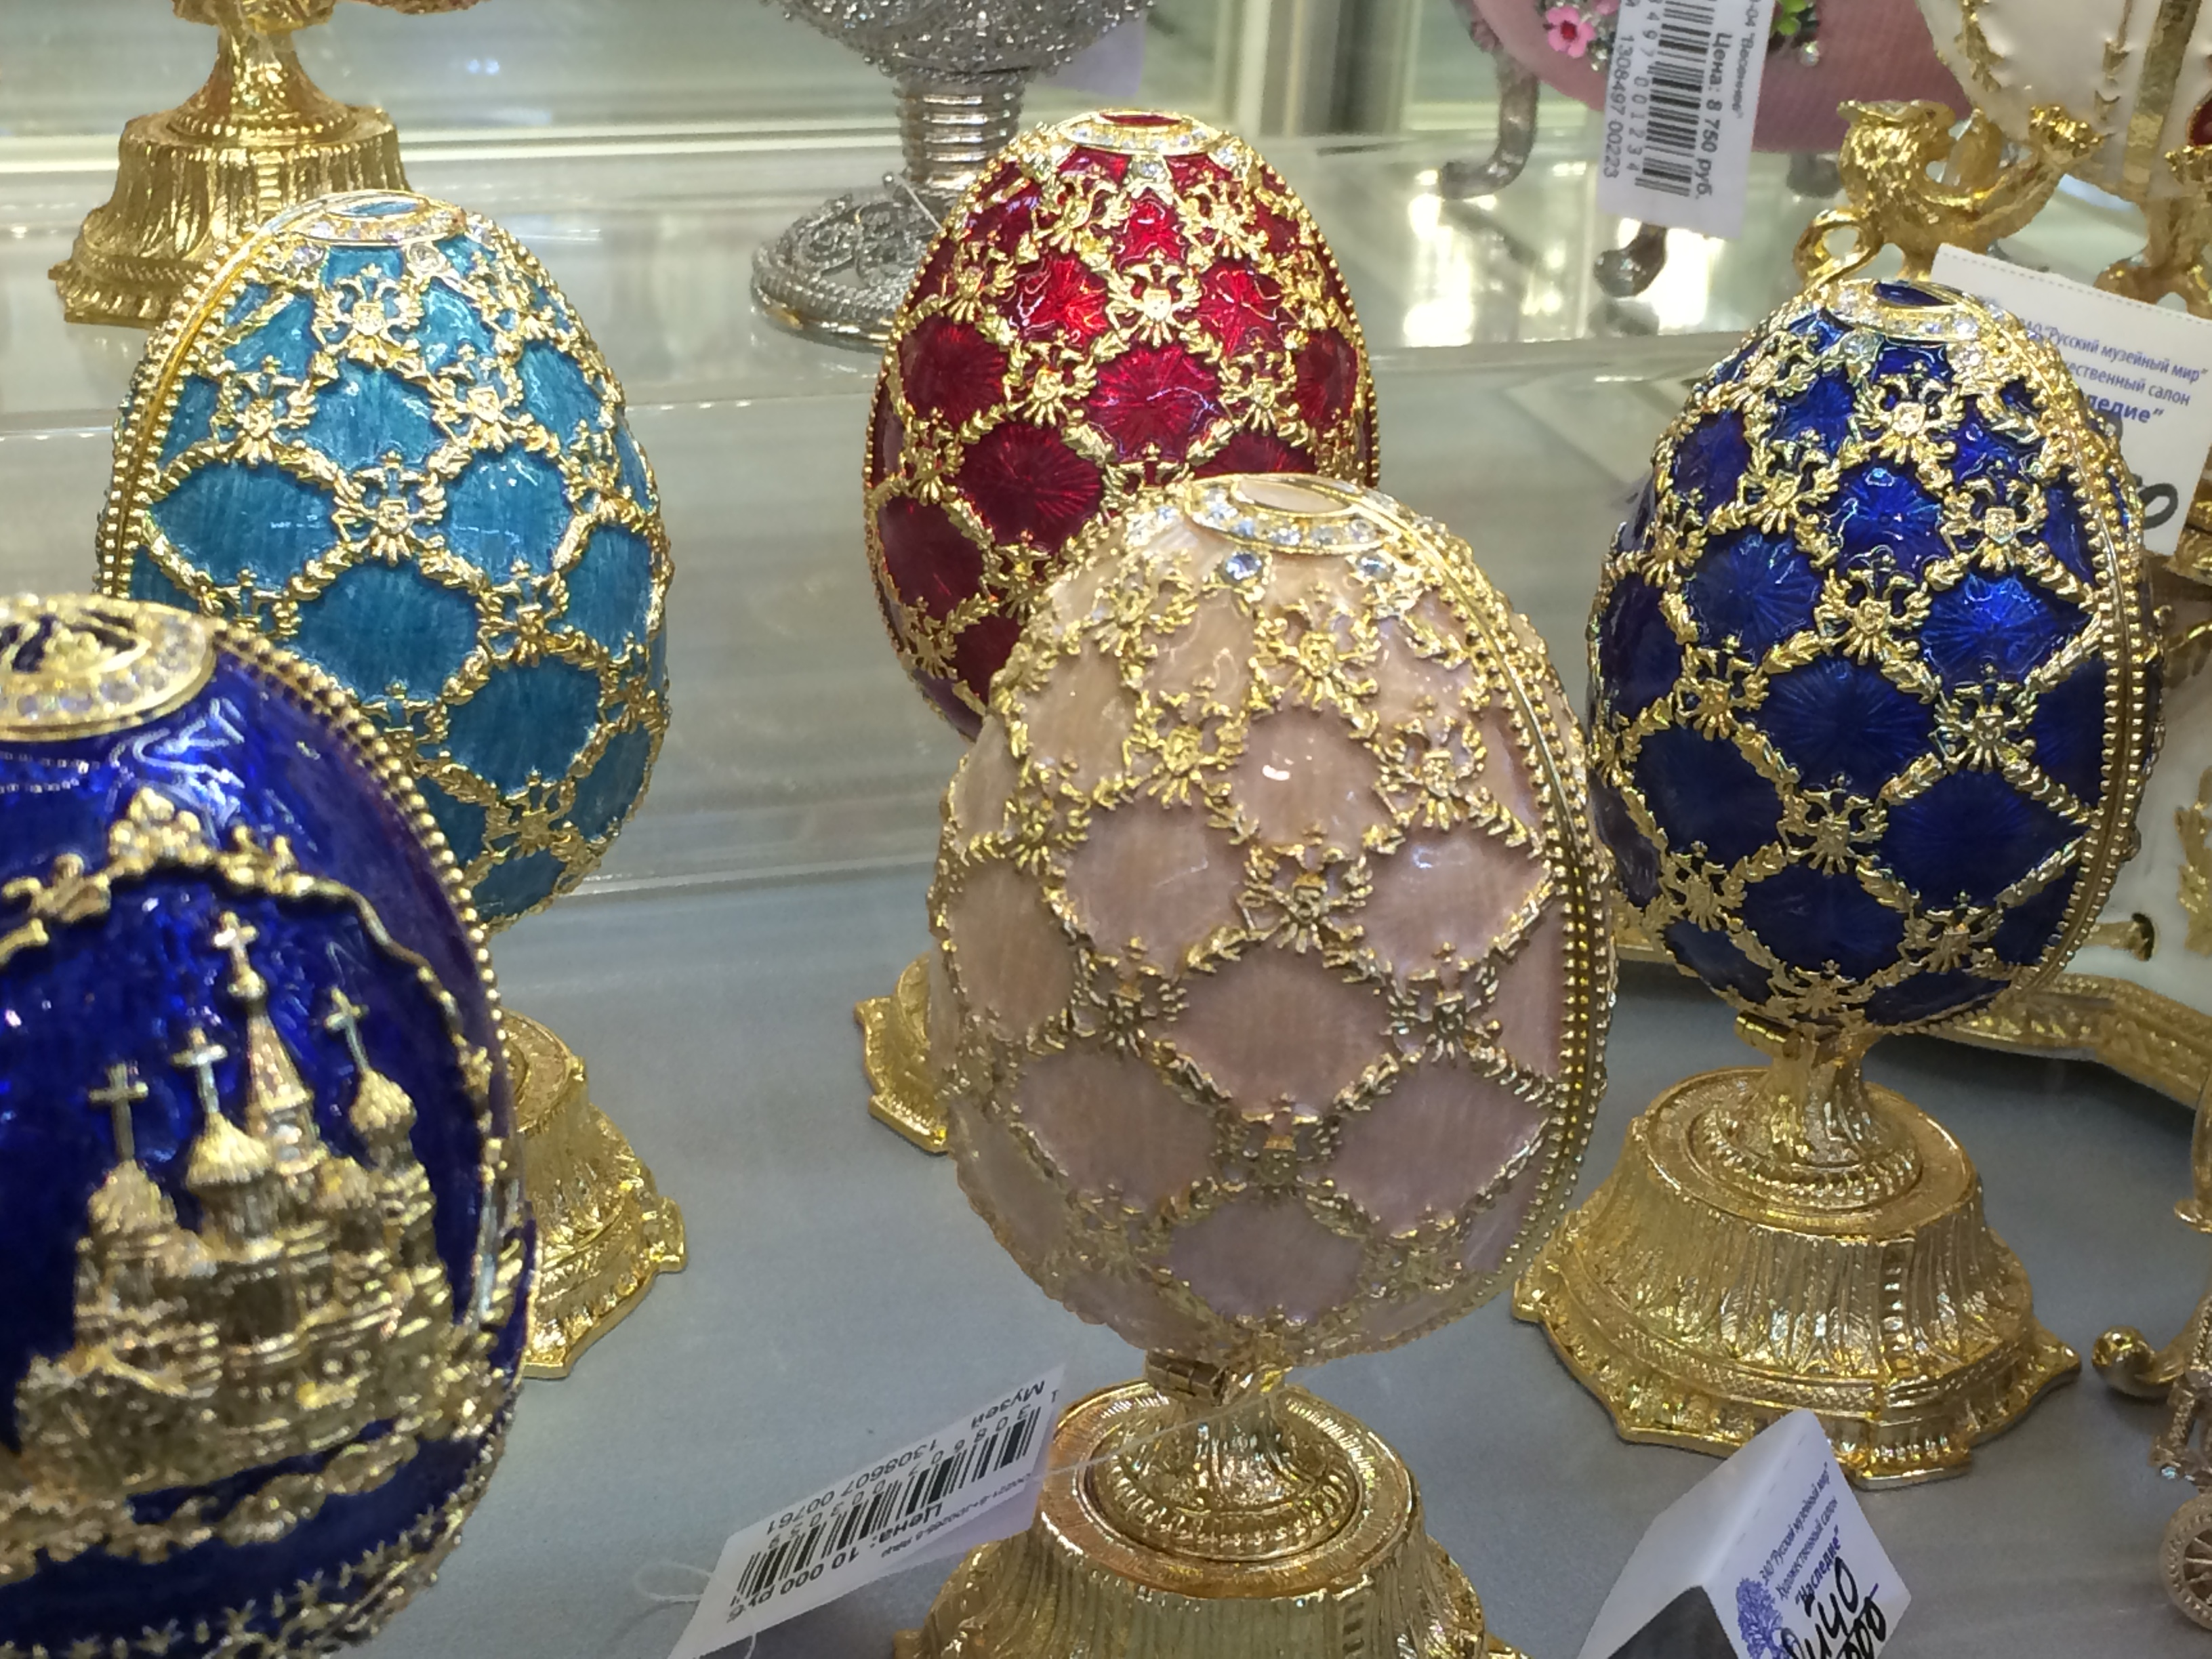 ovos faberge russia dicas 2